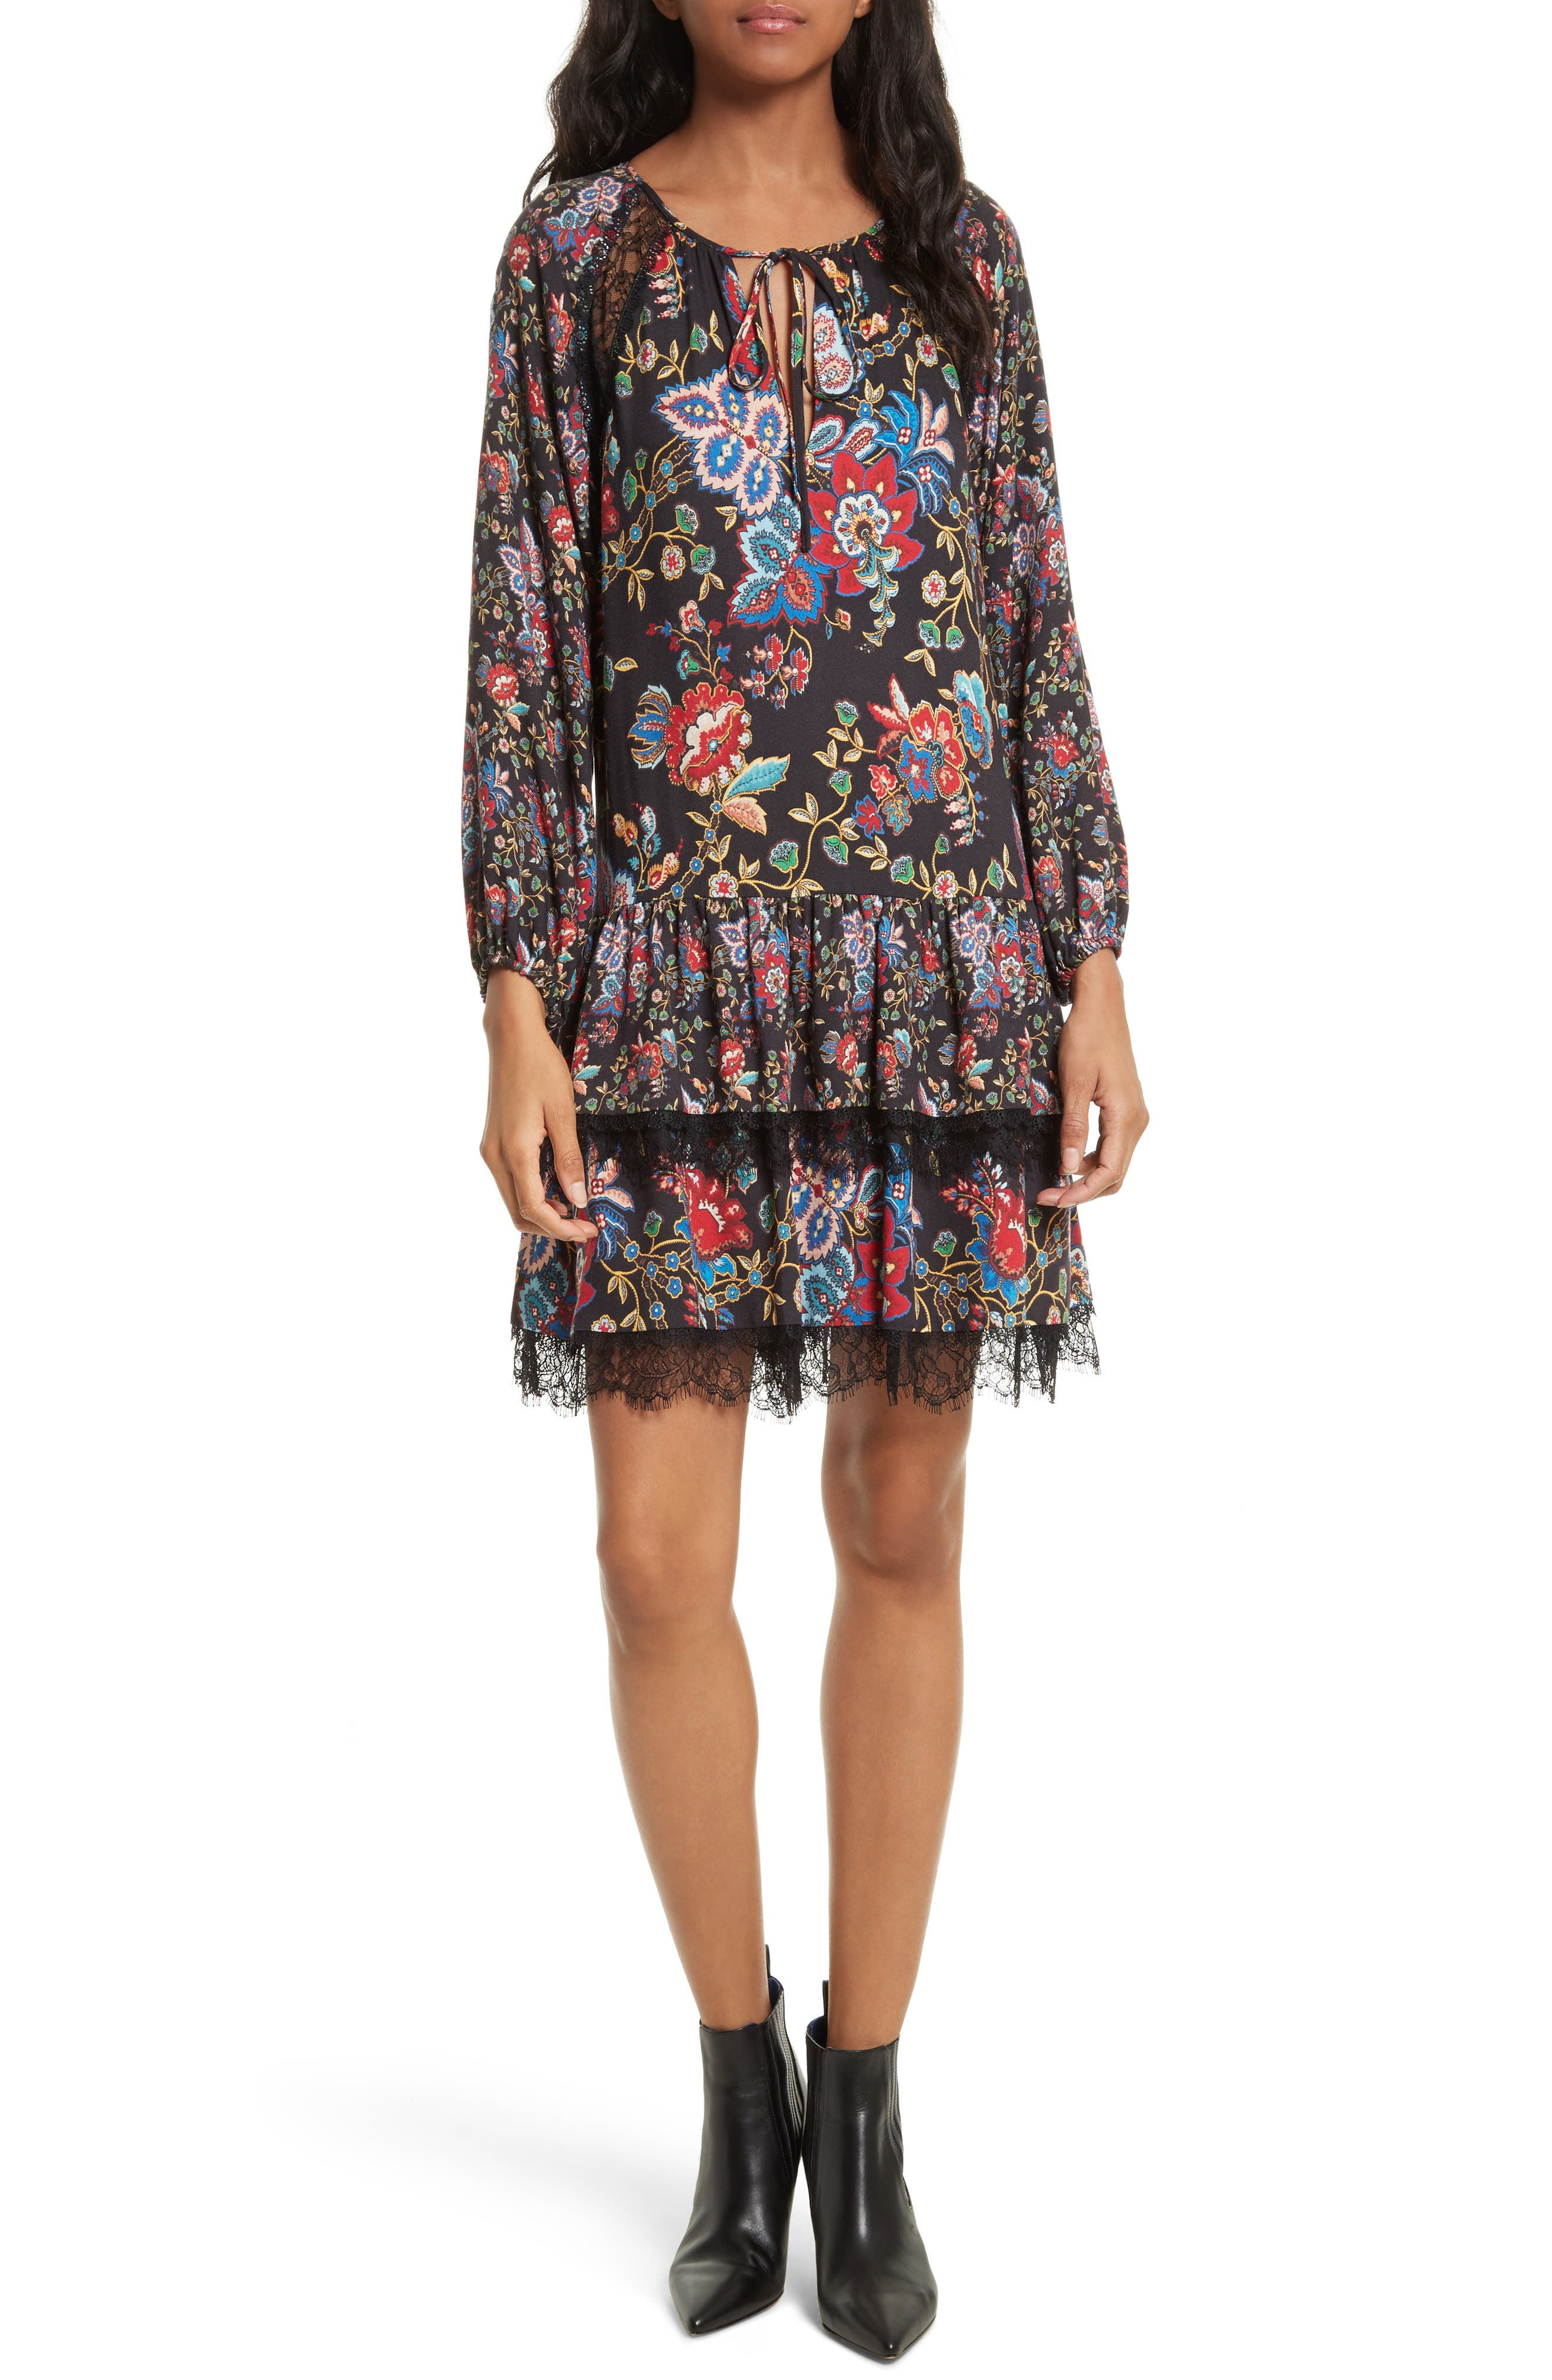 Alternate Image 1 Selected - Alice + Olivia Lakita Tiered Tunic Dress